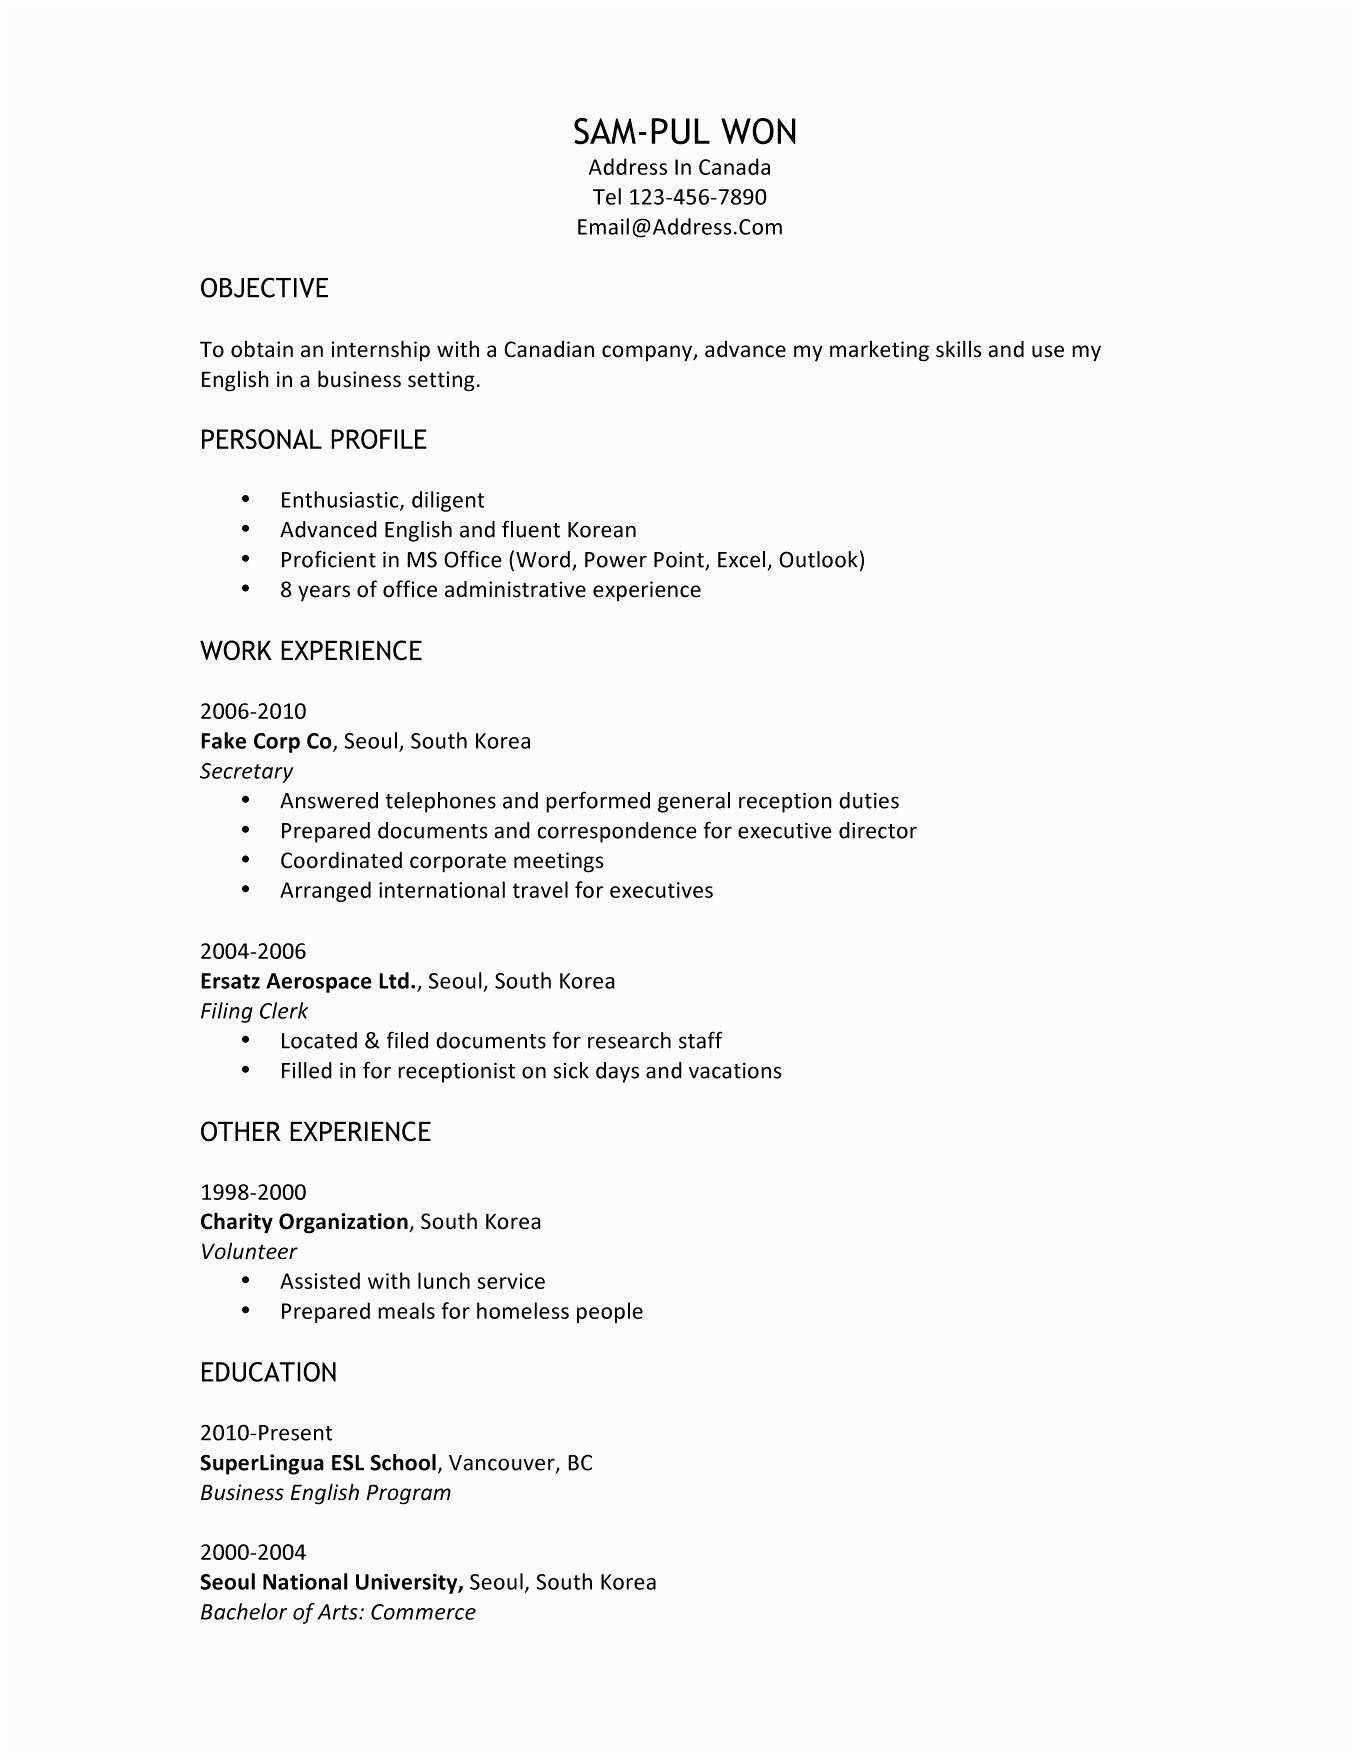 Receptionist Job Description Resume Luxury Fancy Word For Receptionist 50ger Resume Template Examples Receptionist Jobs Resume